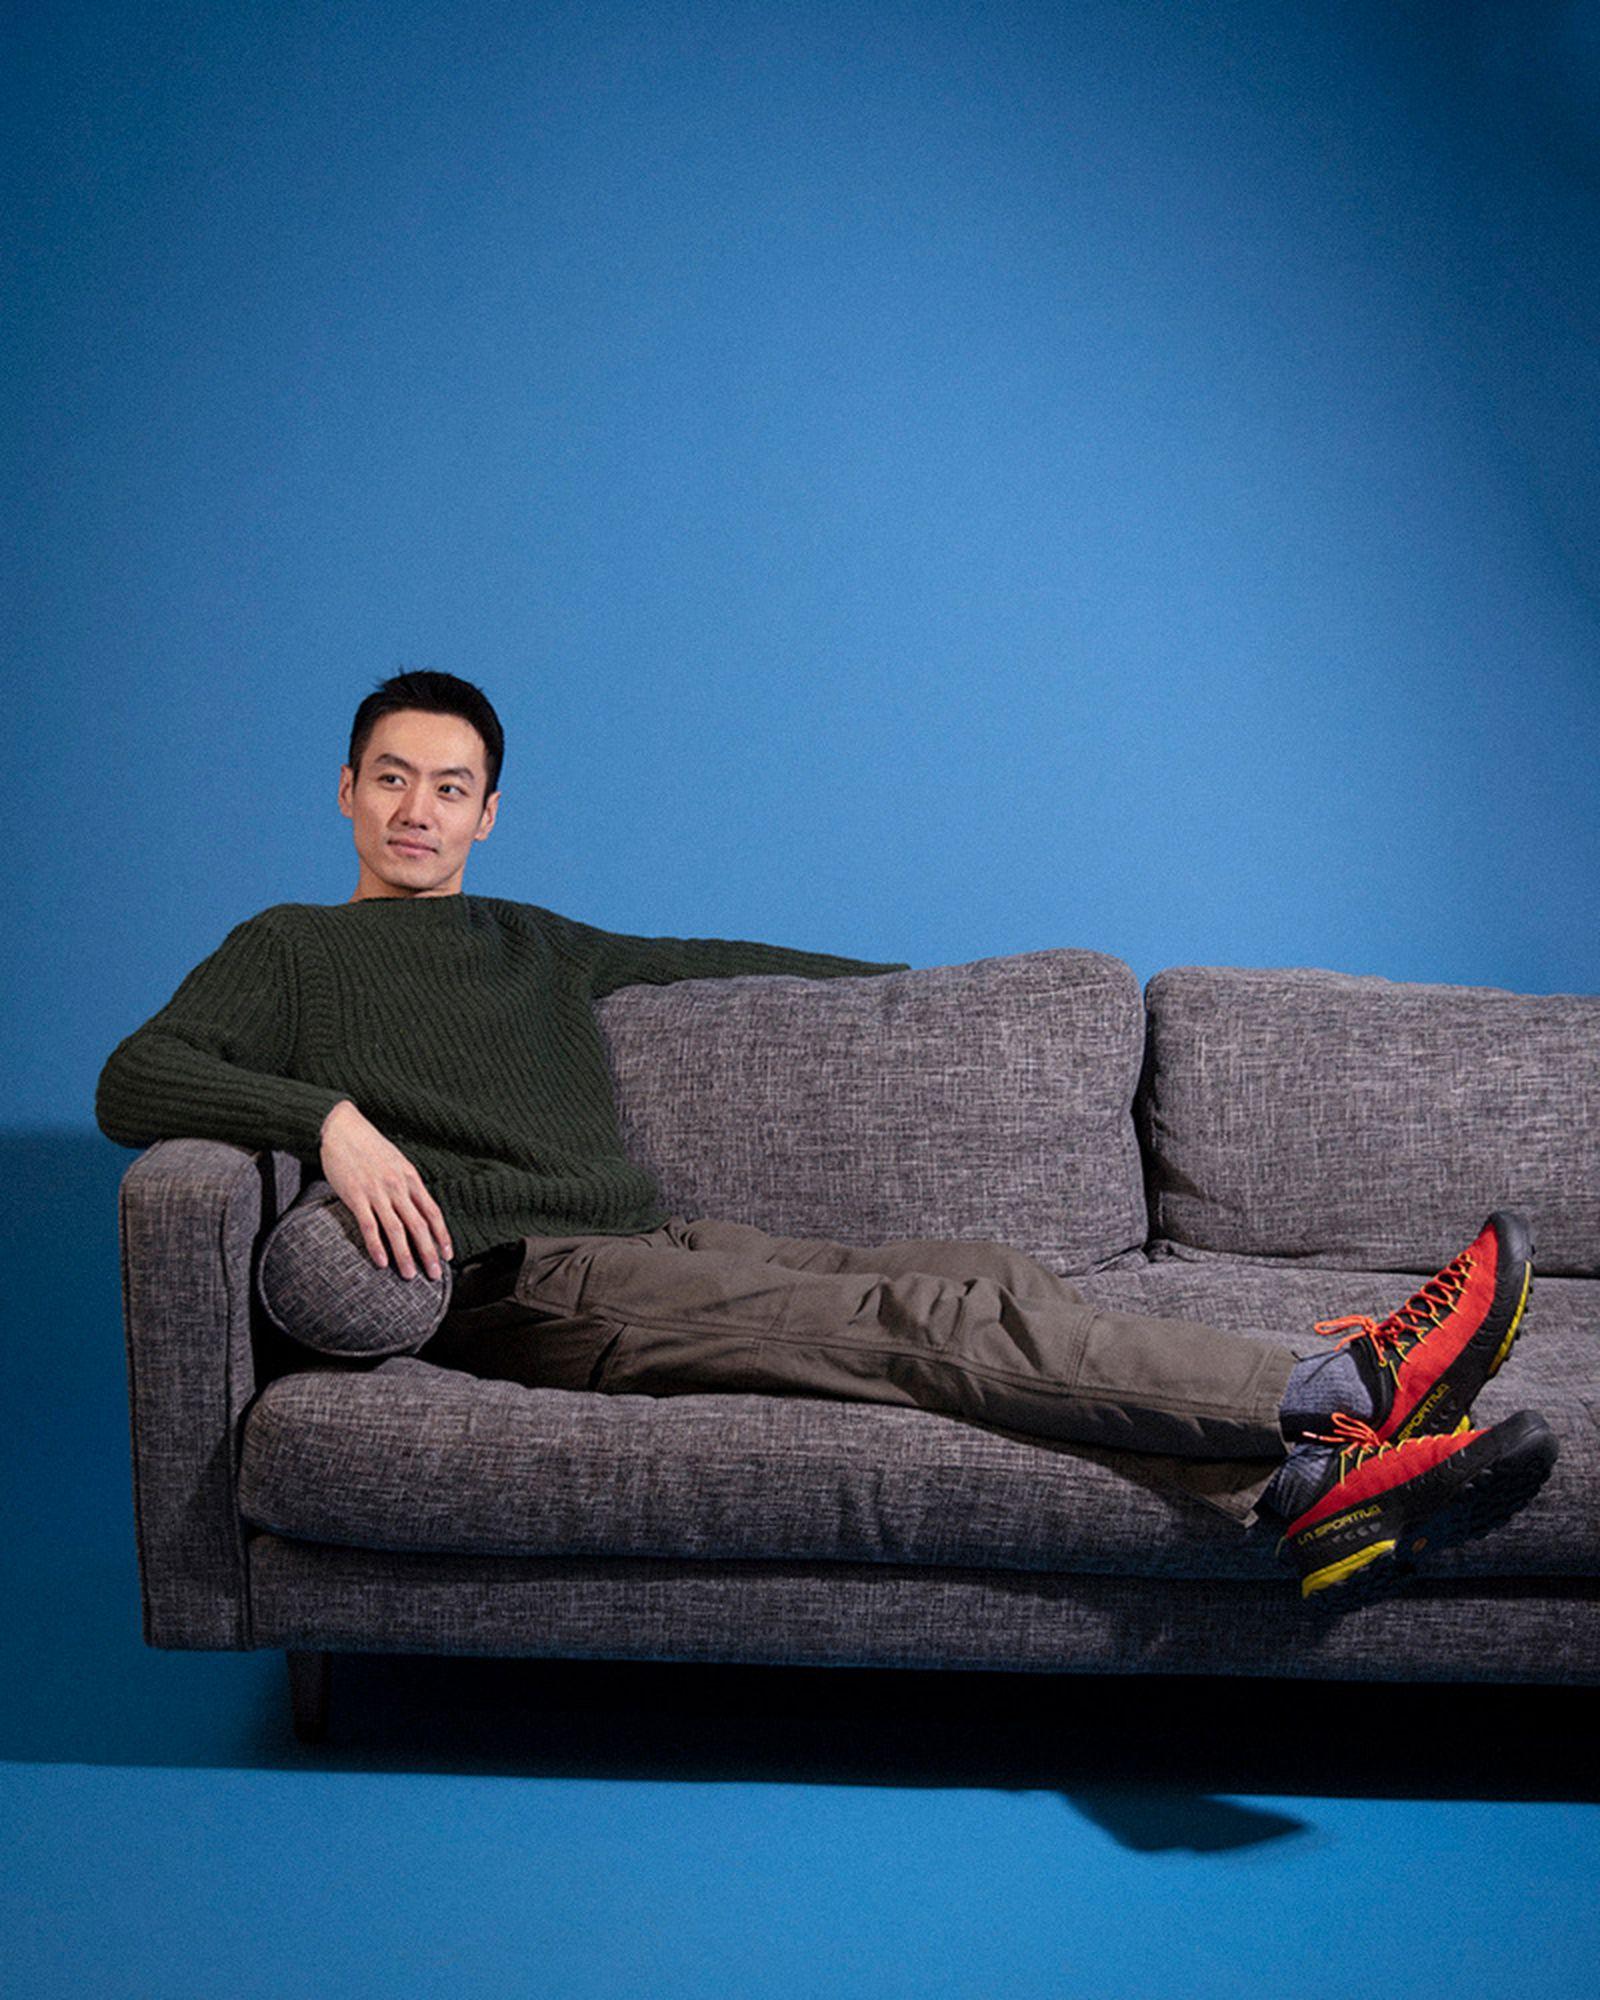 leo-wang-buffy-life-coach-bed-hygiene-01